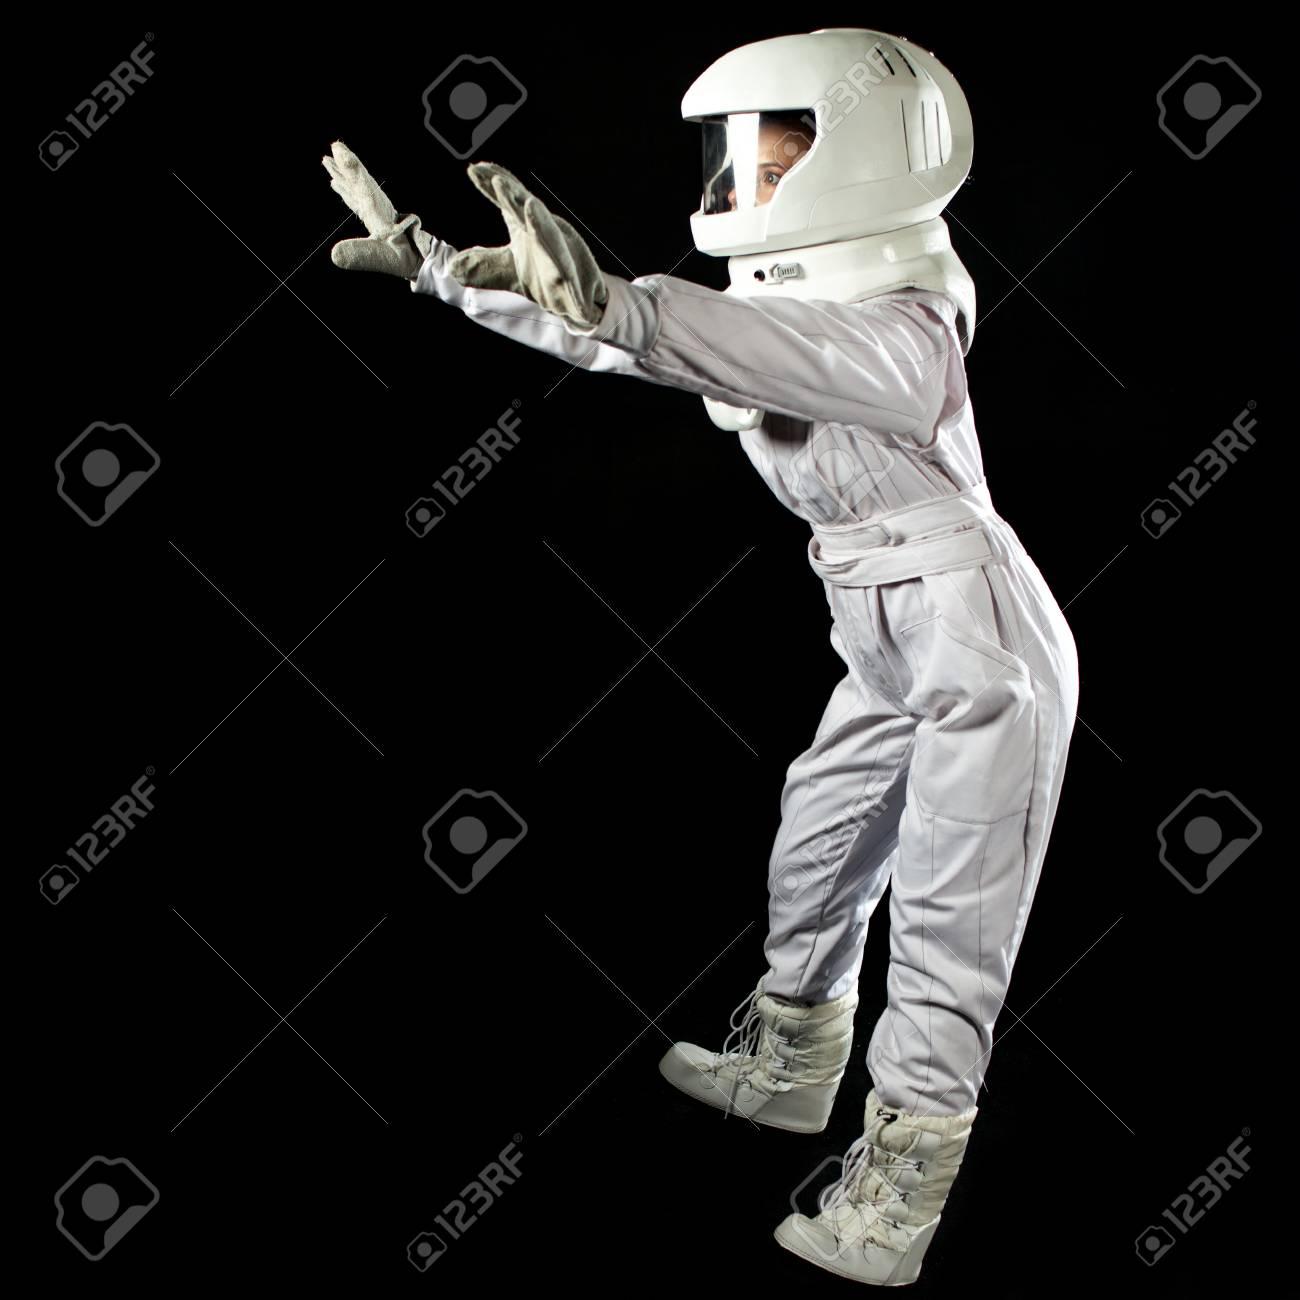 Astronaut in space, in zero gravity on black background  Man